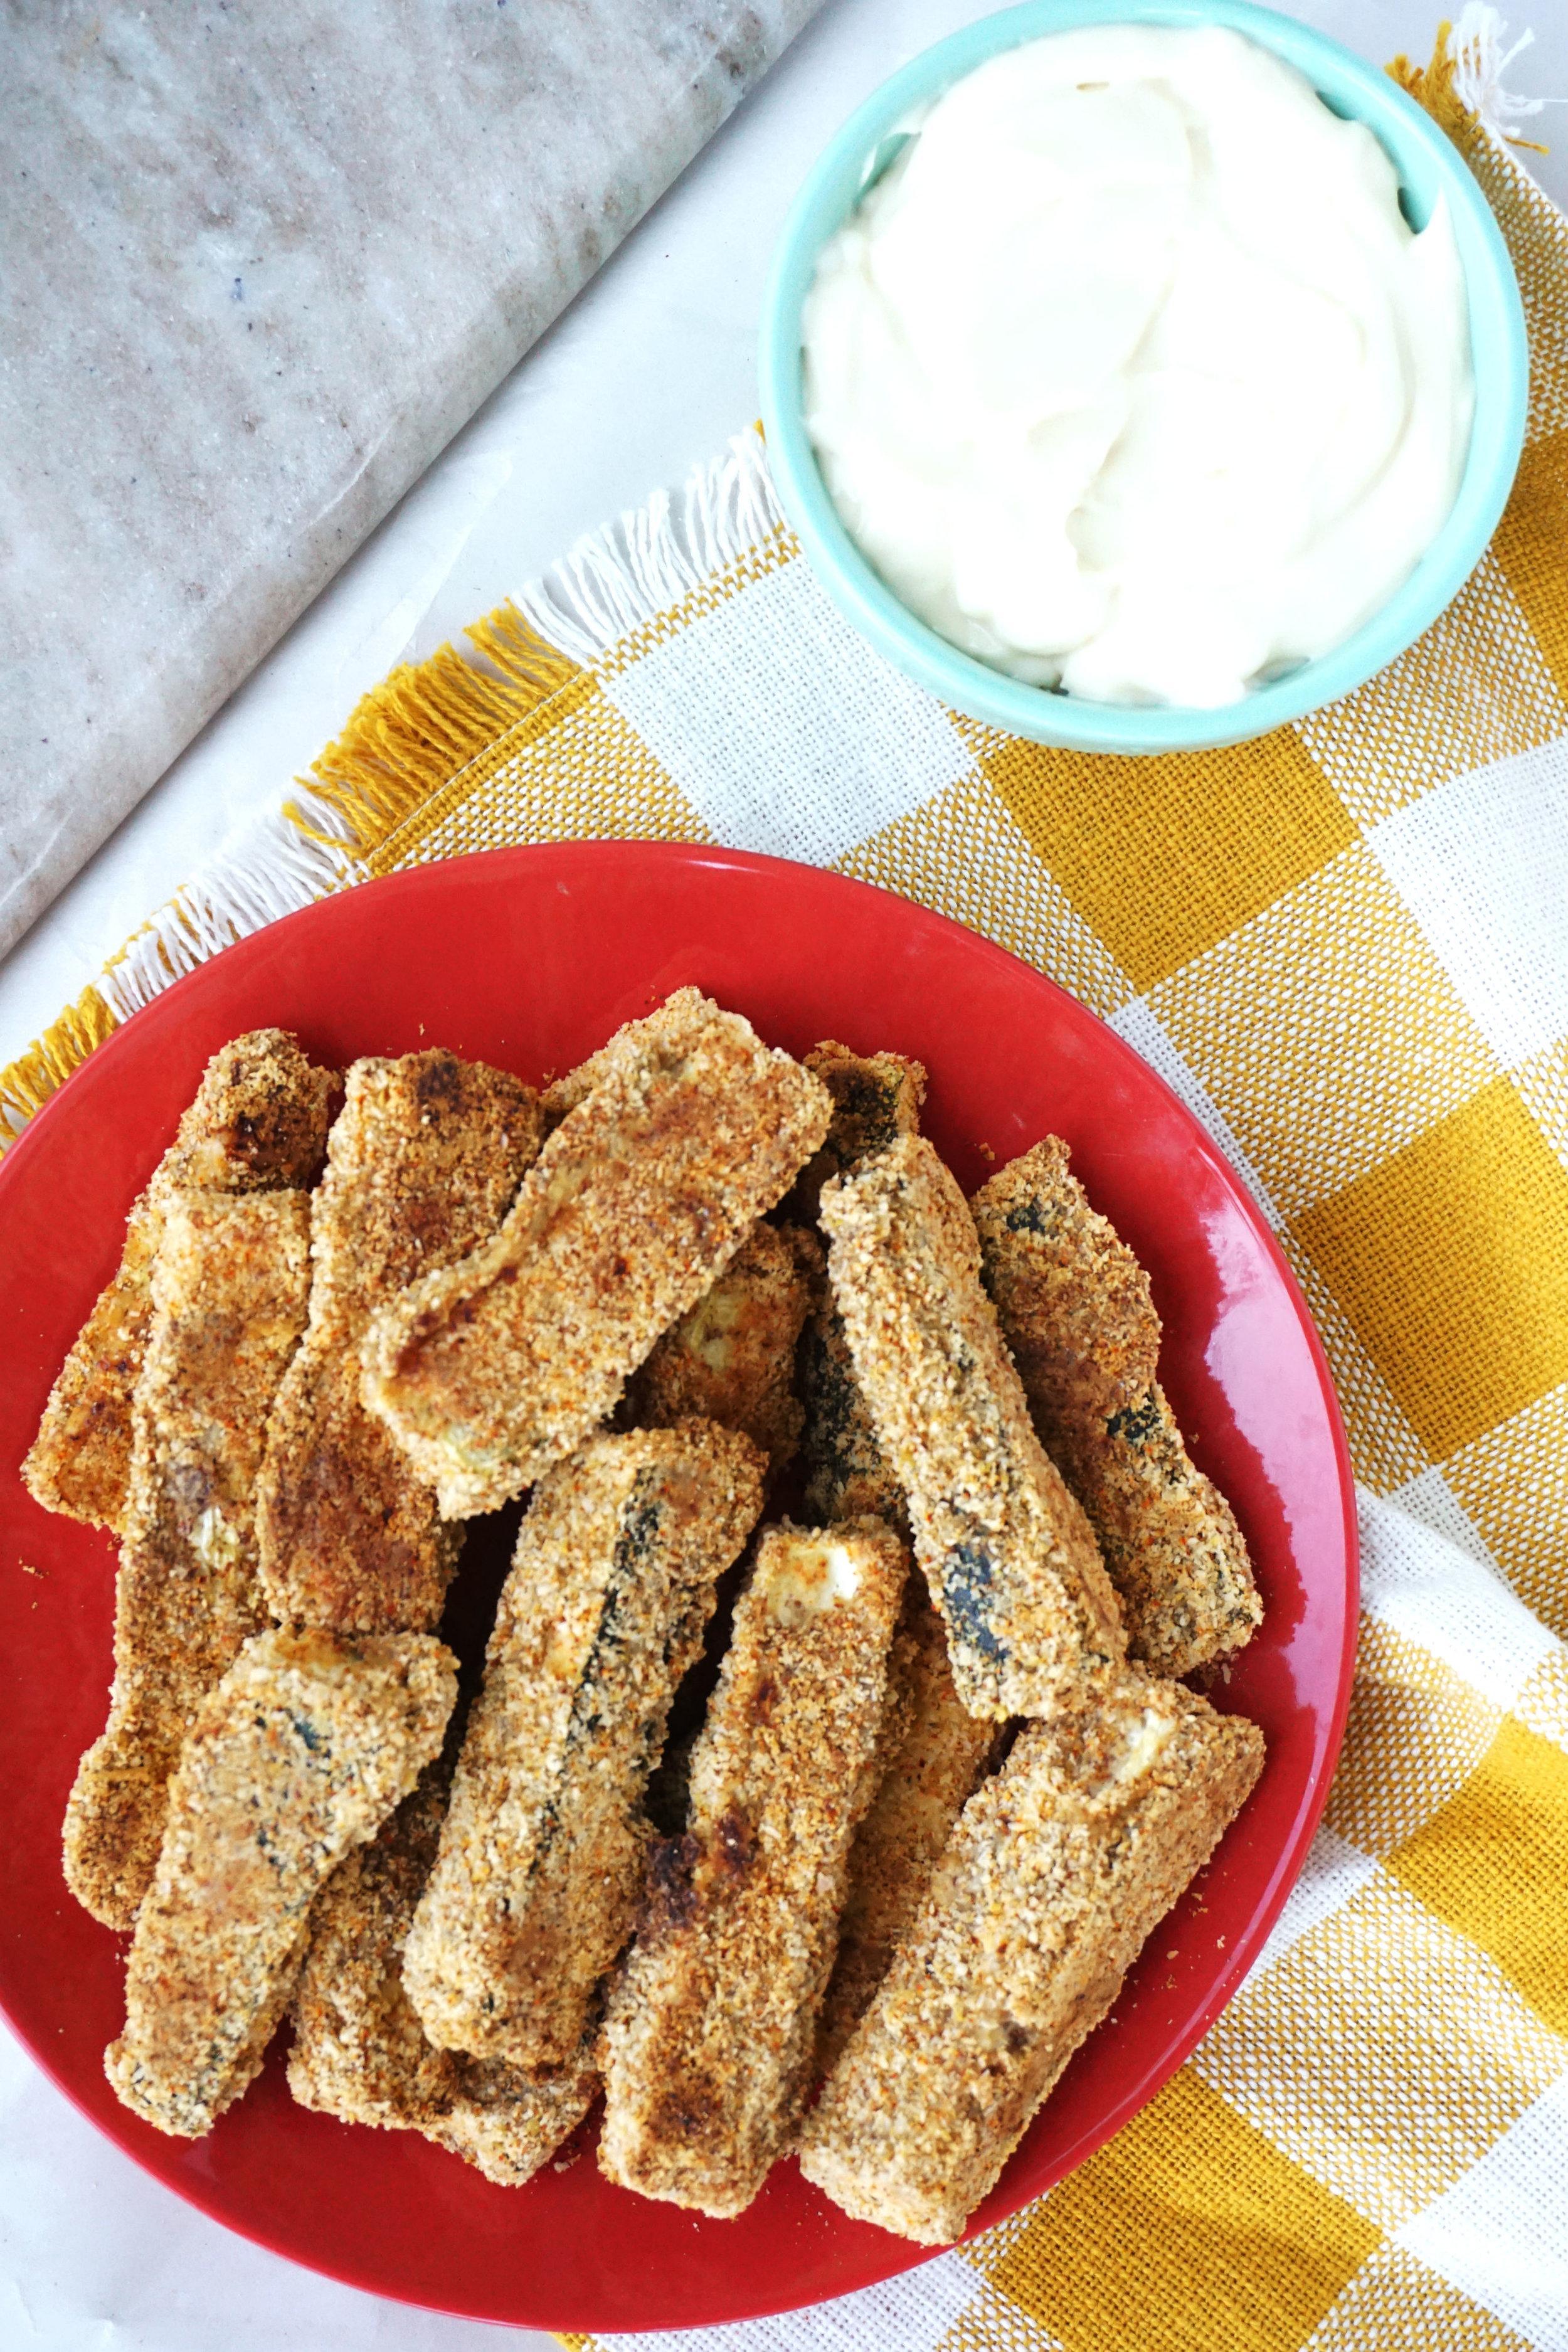 Crispy Baked Zucchini Fries (Vegan, GF, Paleo)